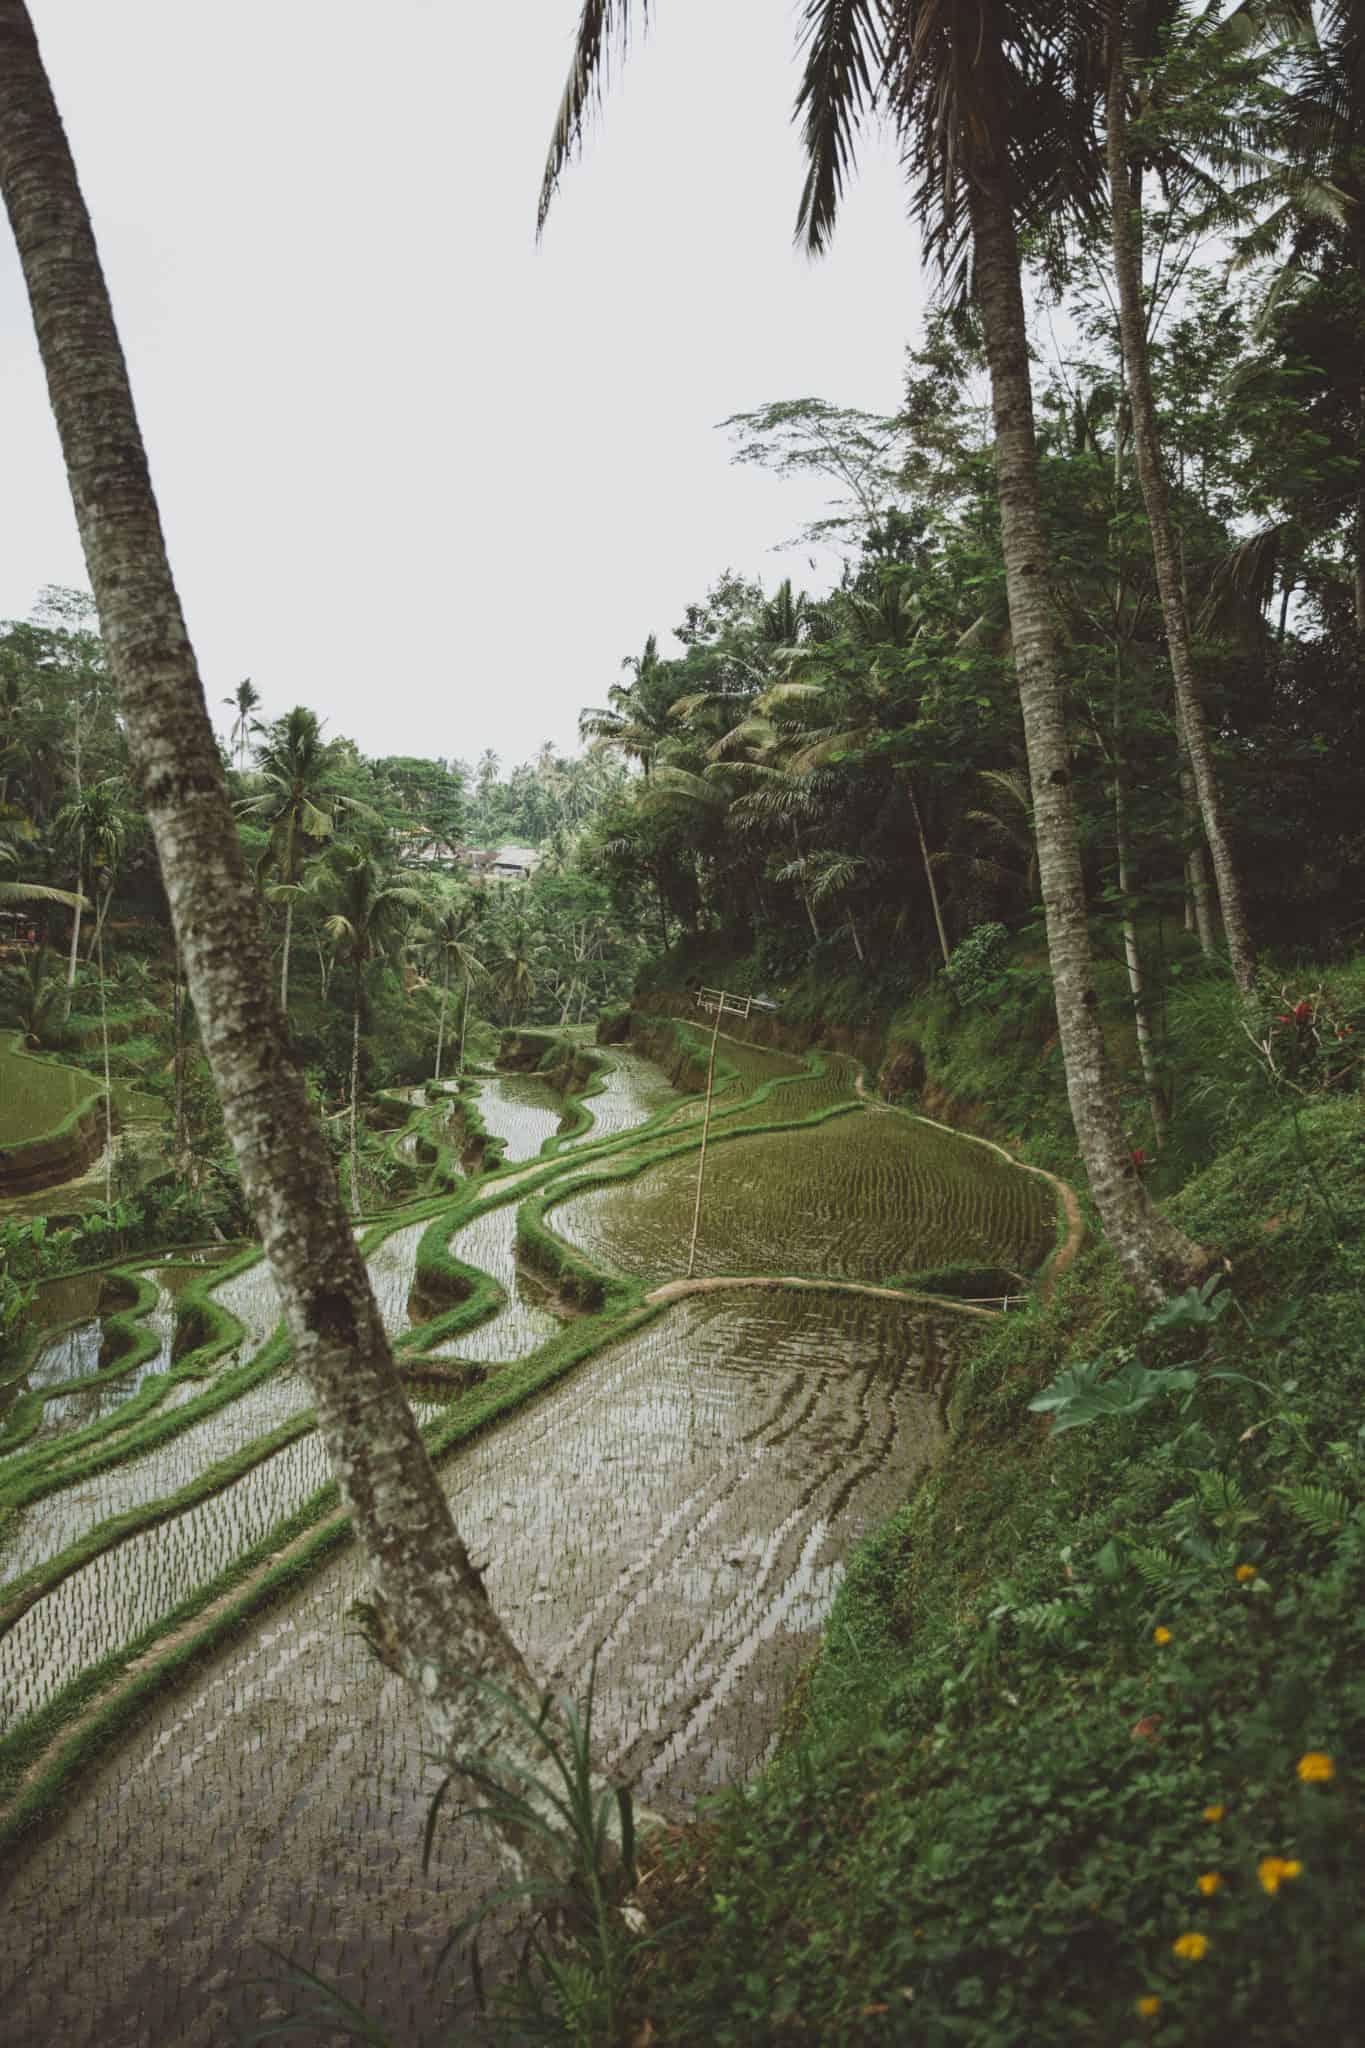 Emily Mandagie in the Tegalalang Rice Terraces, Ubud, Bali - TheMandagies.com